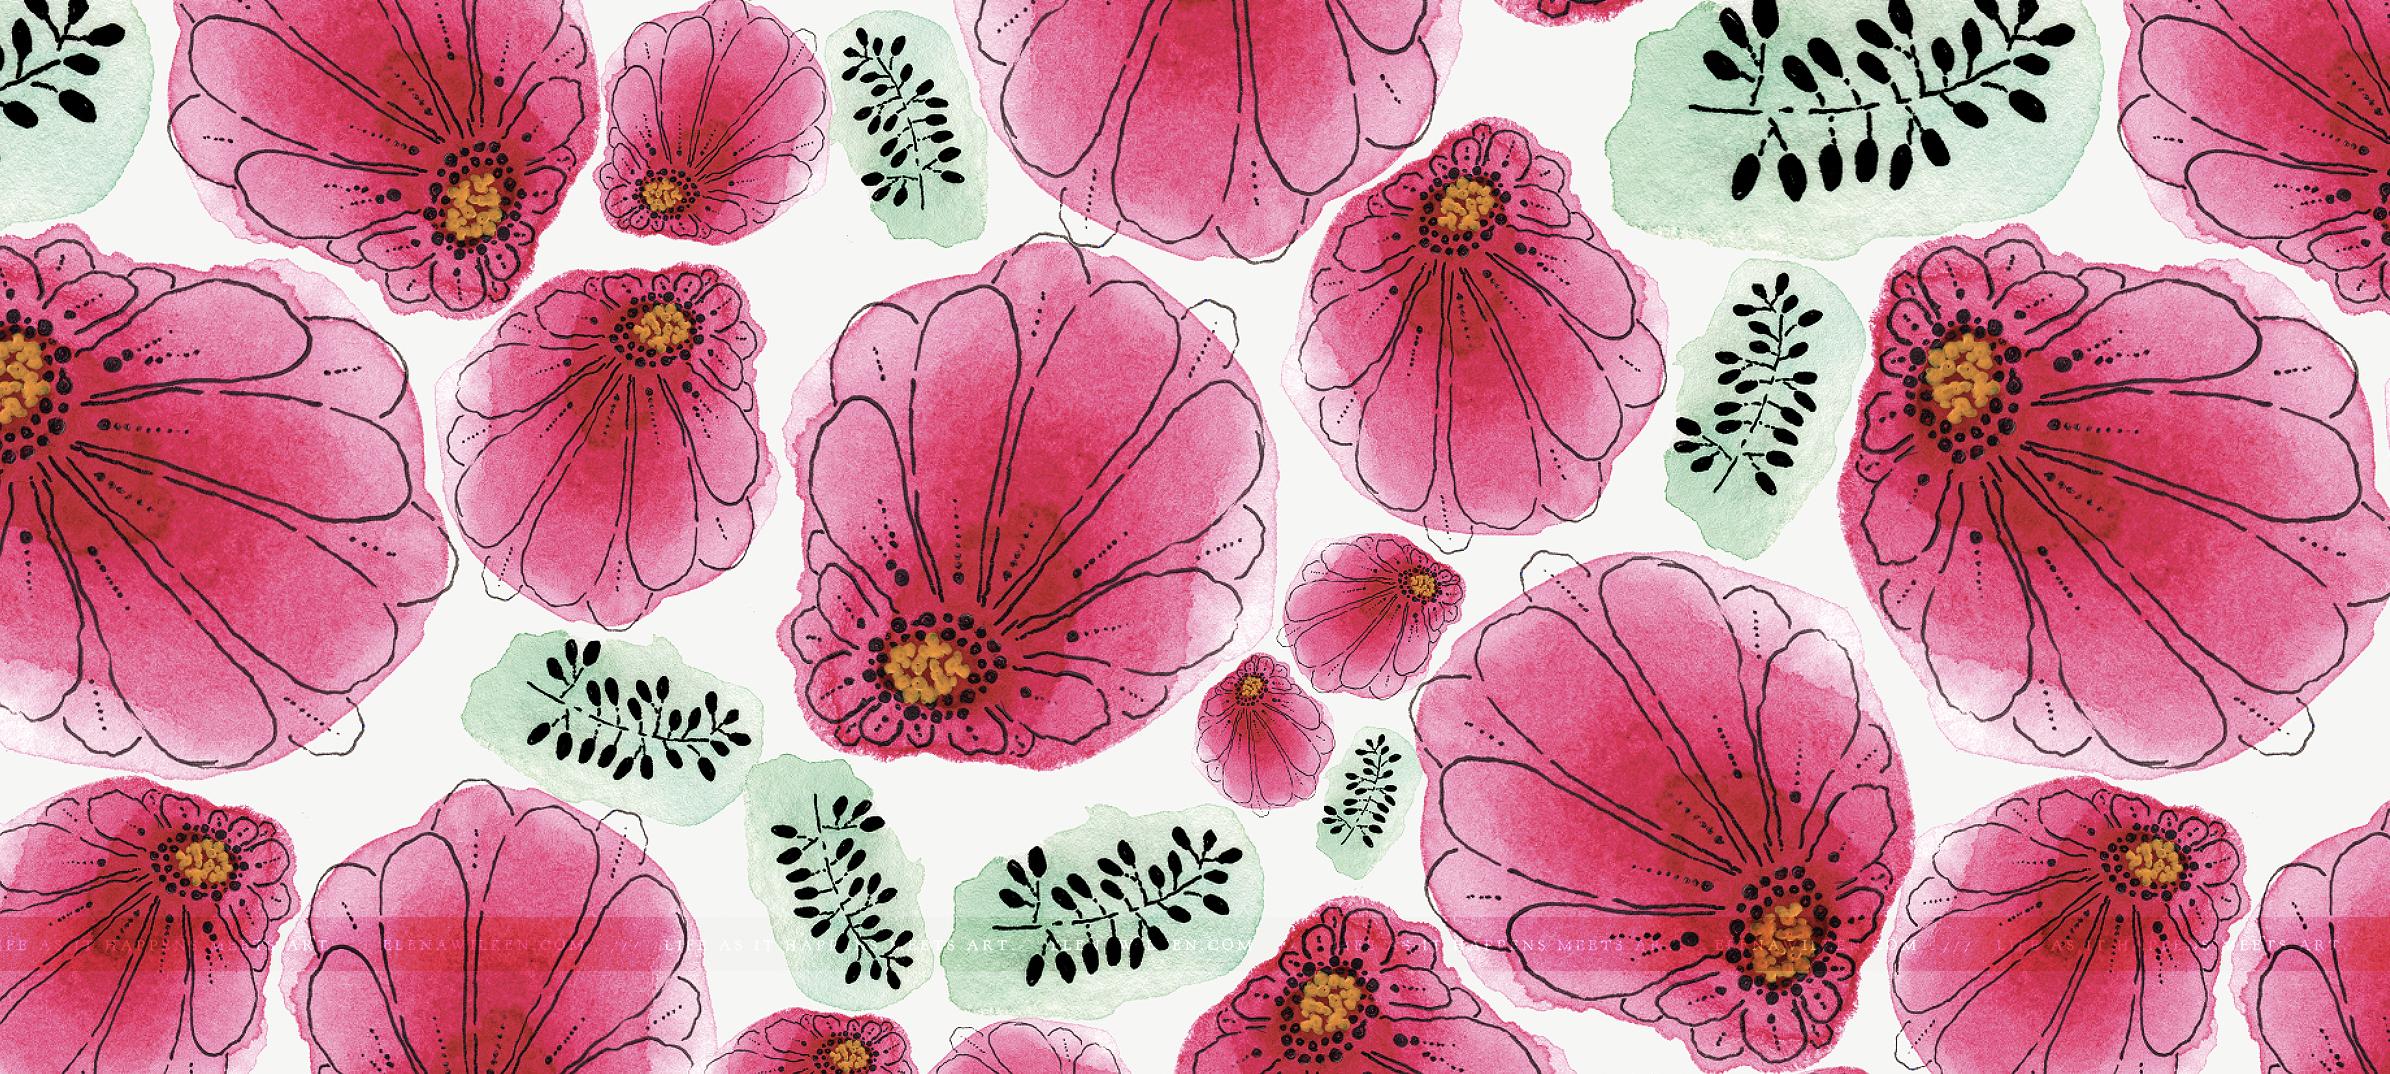 elena-wilken-whimsical-watercolor-fields-surface-pattern-design7.png